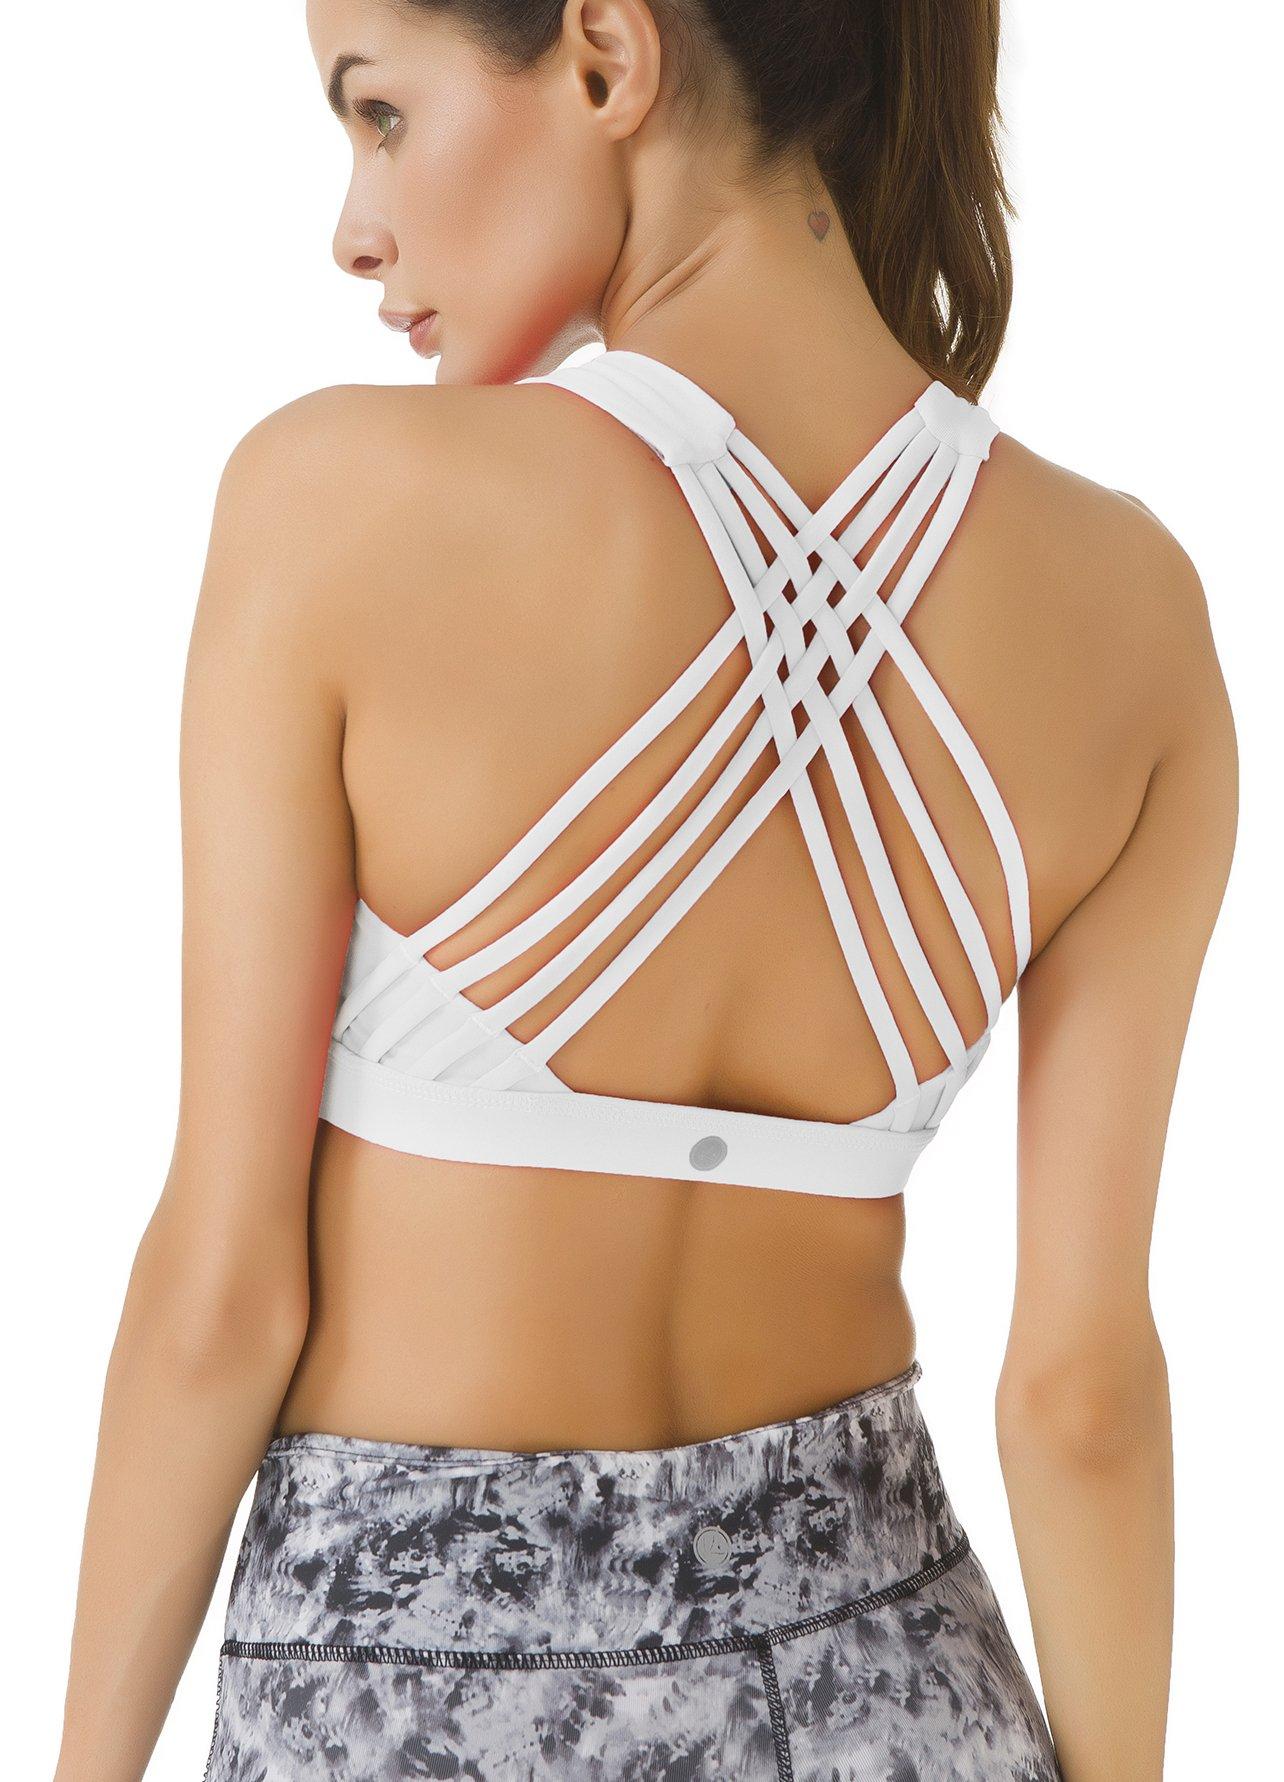 Queenie Ke Women's Medium Support Strappy Back Energy Sport Bra Cotton Feel Size M Color Angle White